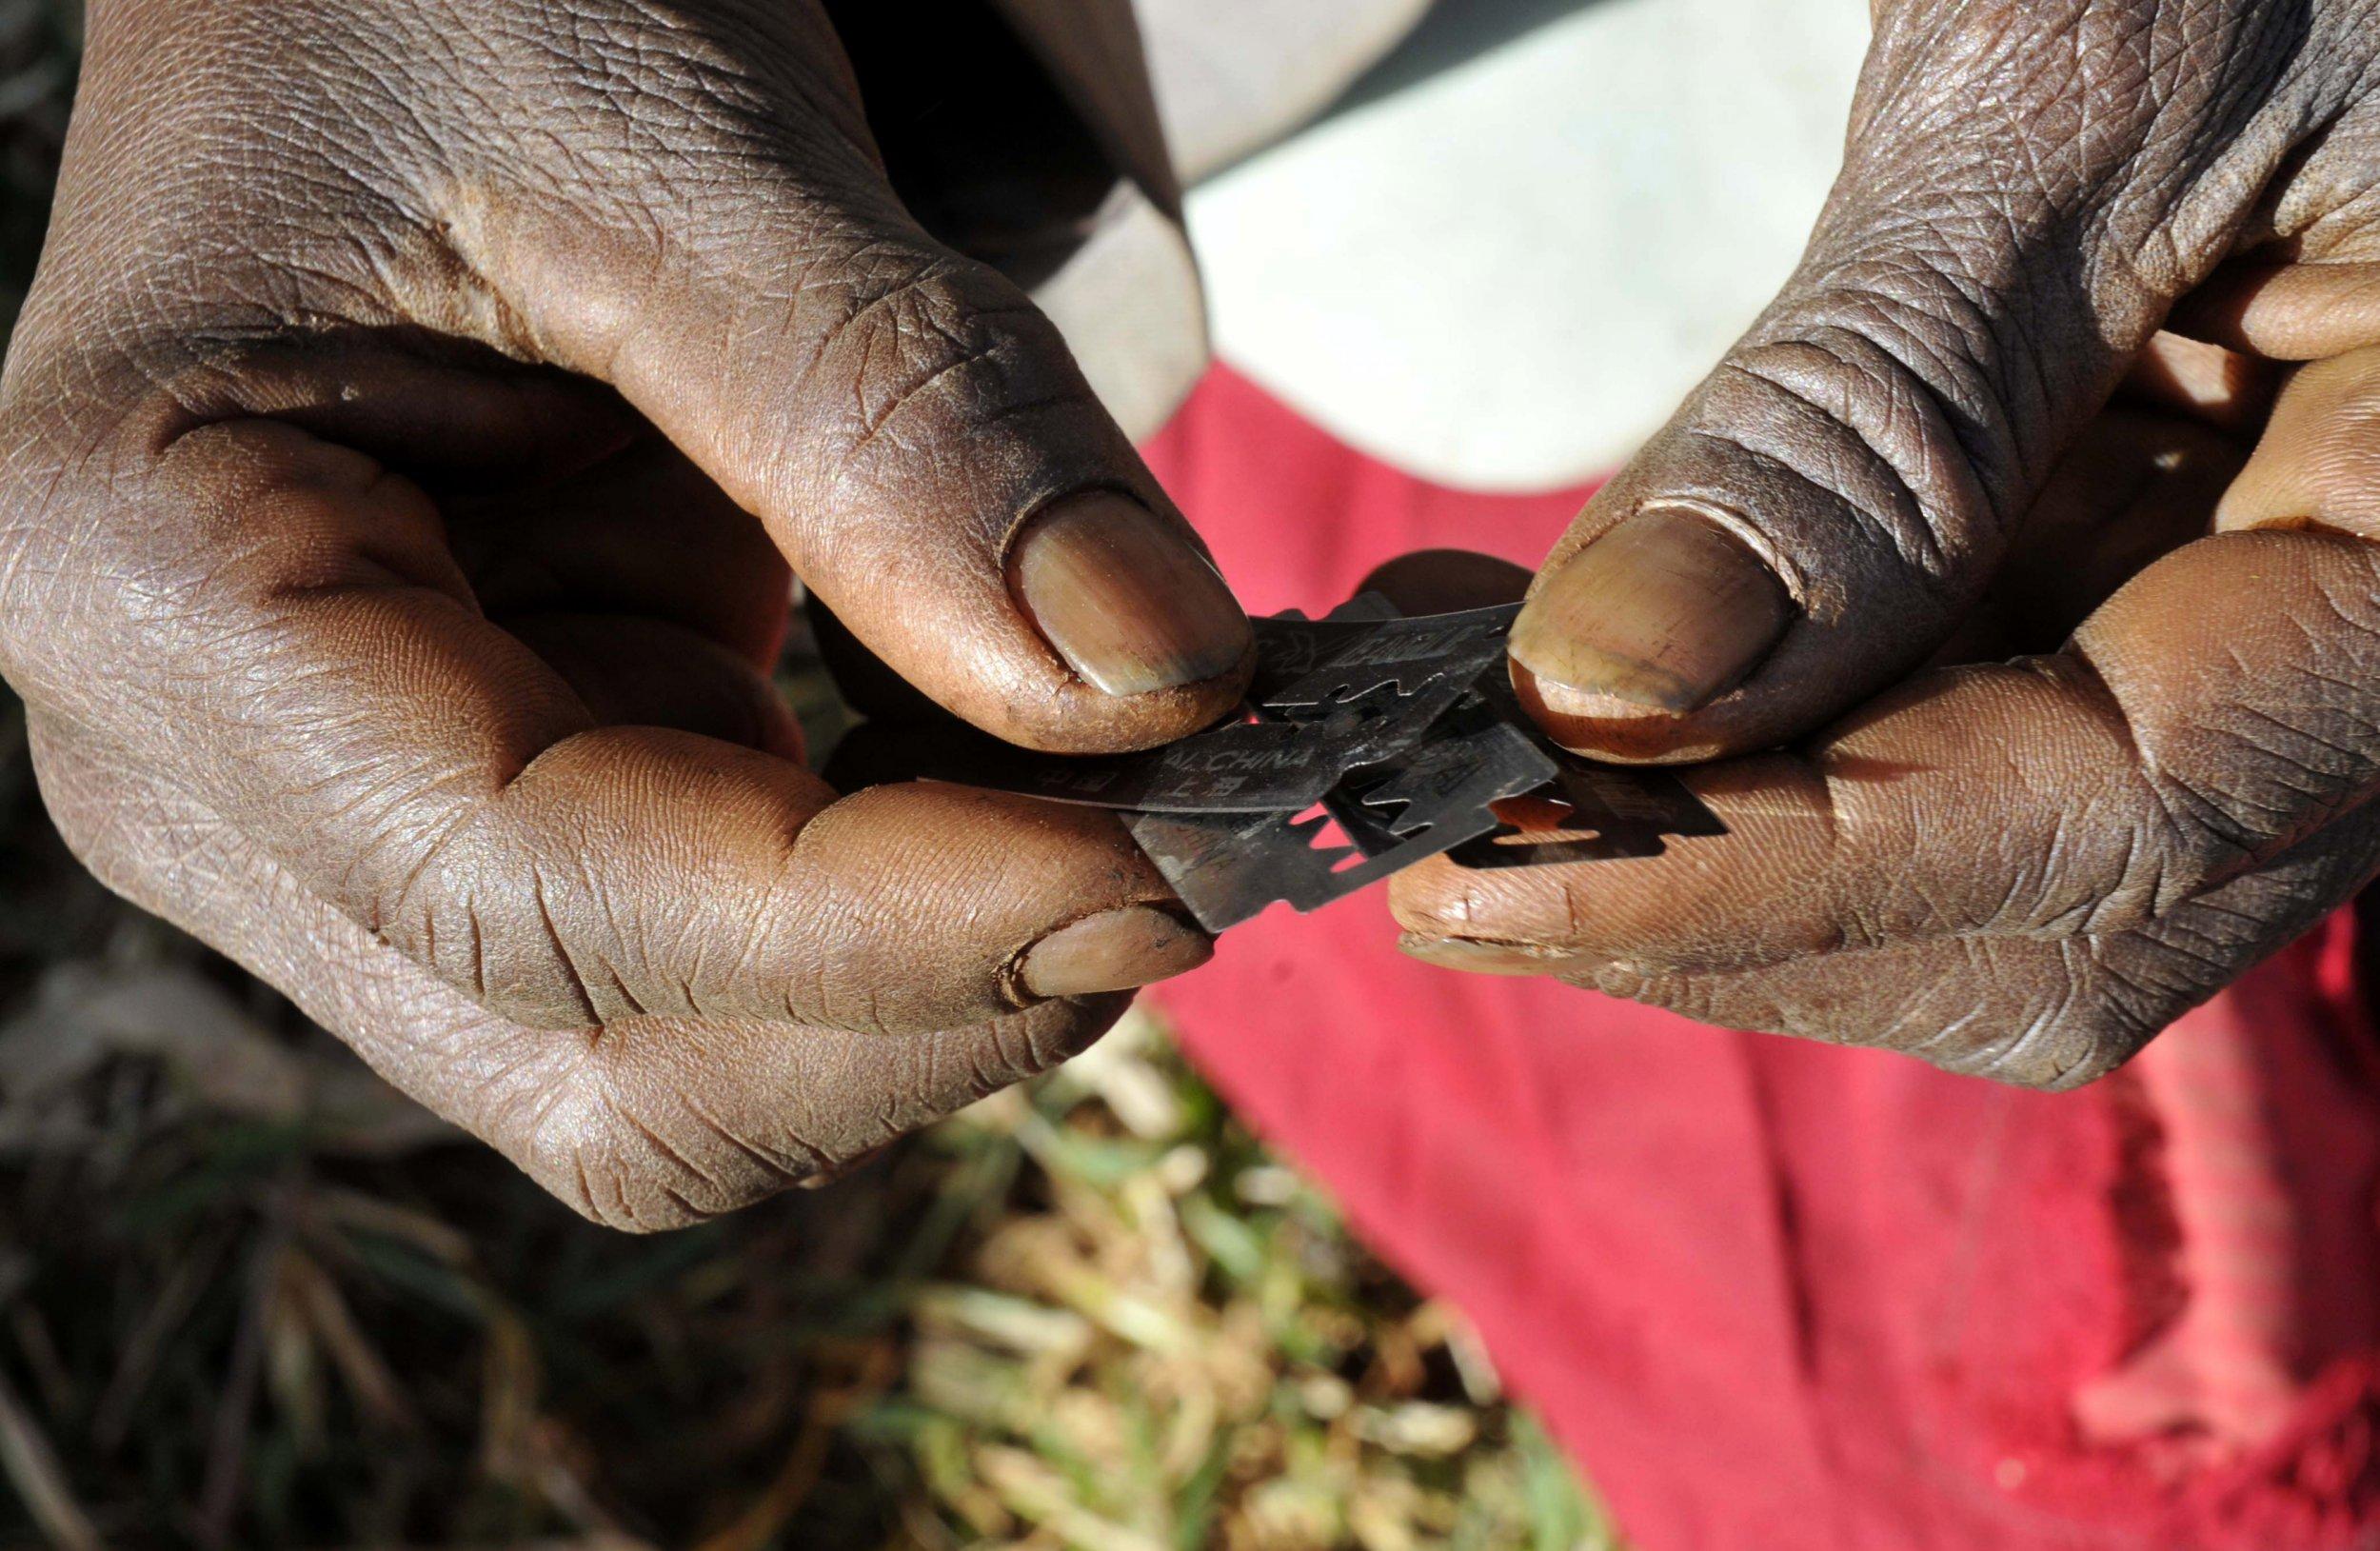 fgm female genital mutilation compromise study_0222